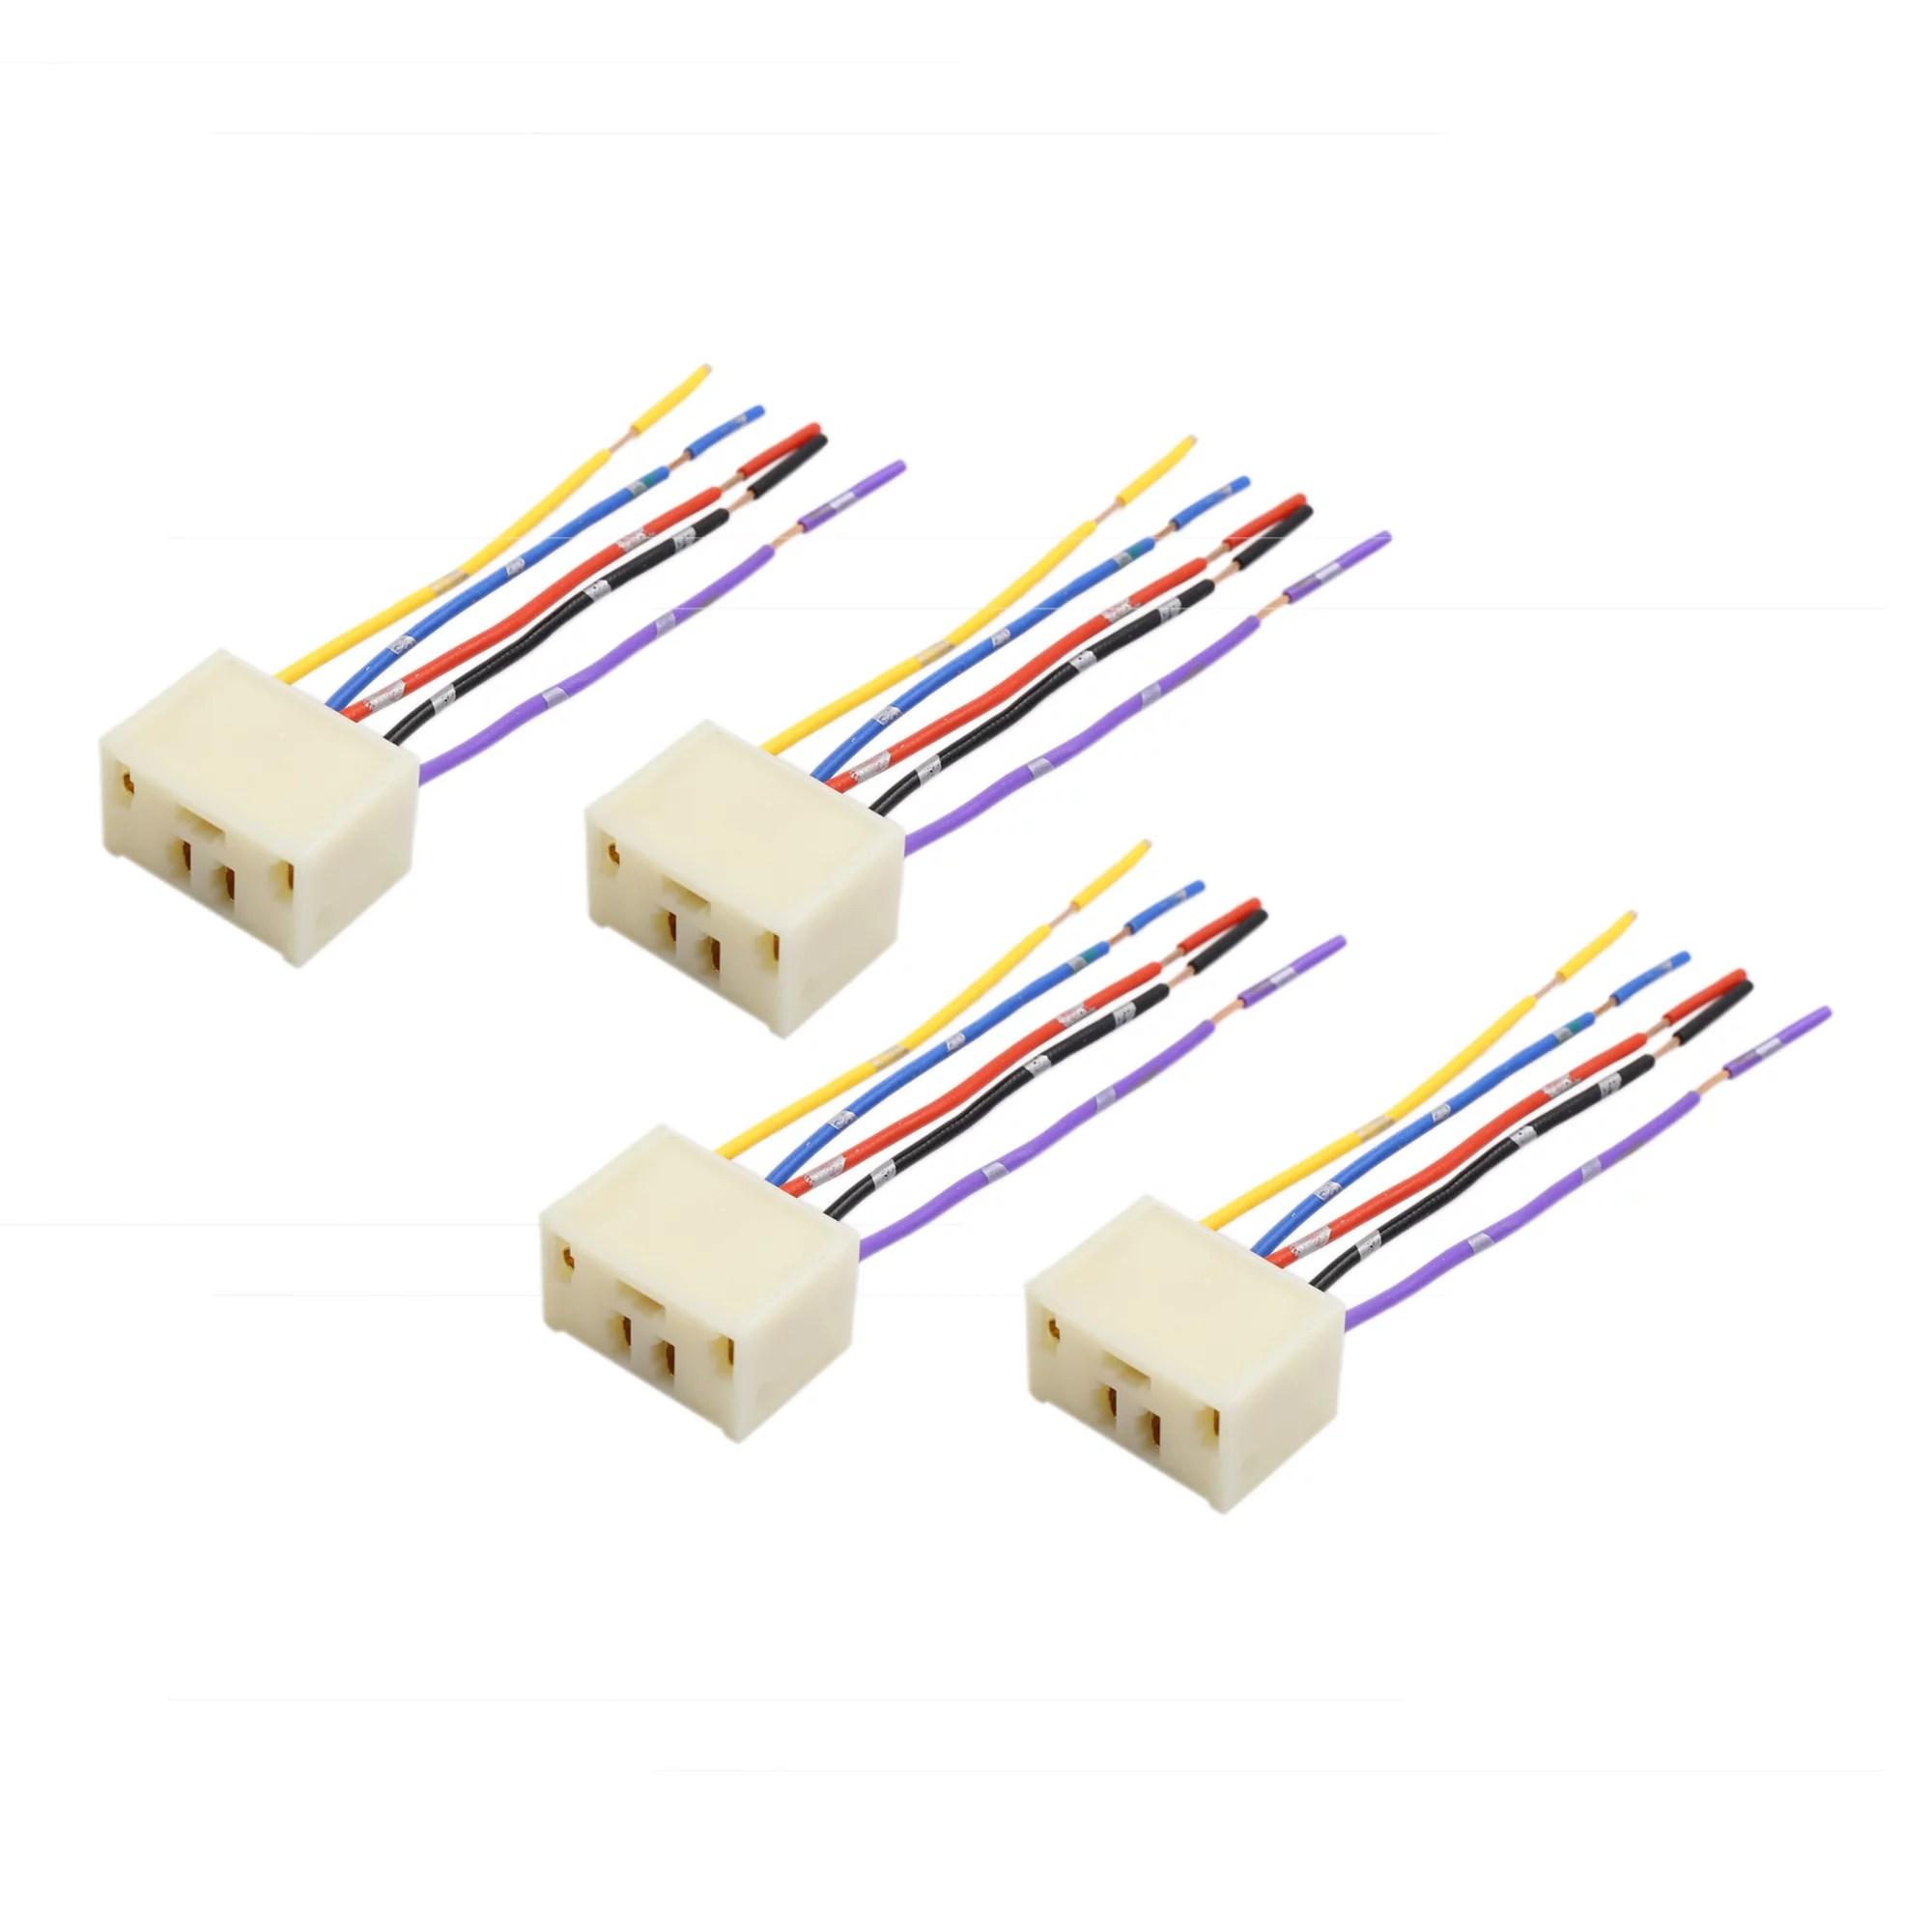 small resolution of 4pcs dc 12v 5 pin car power window switch socket wiring harness plug adapter walmart canada